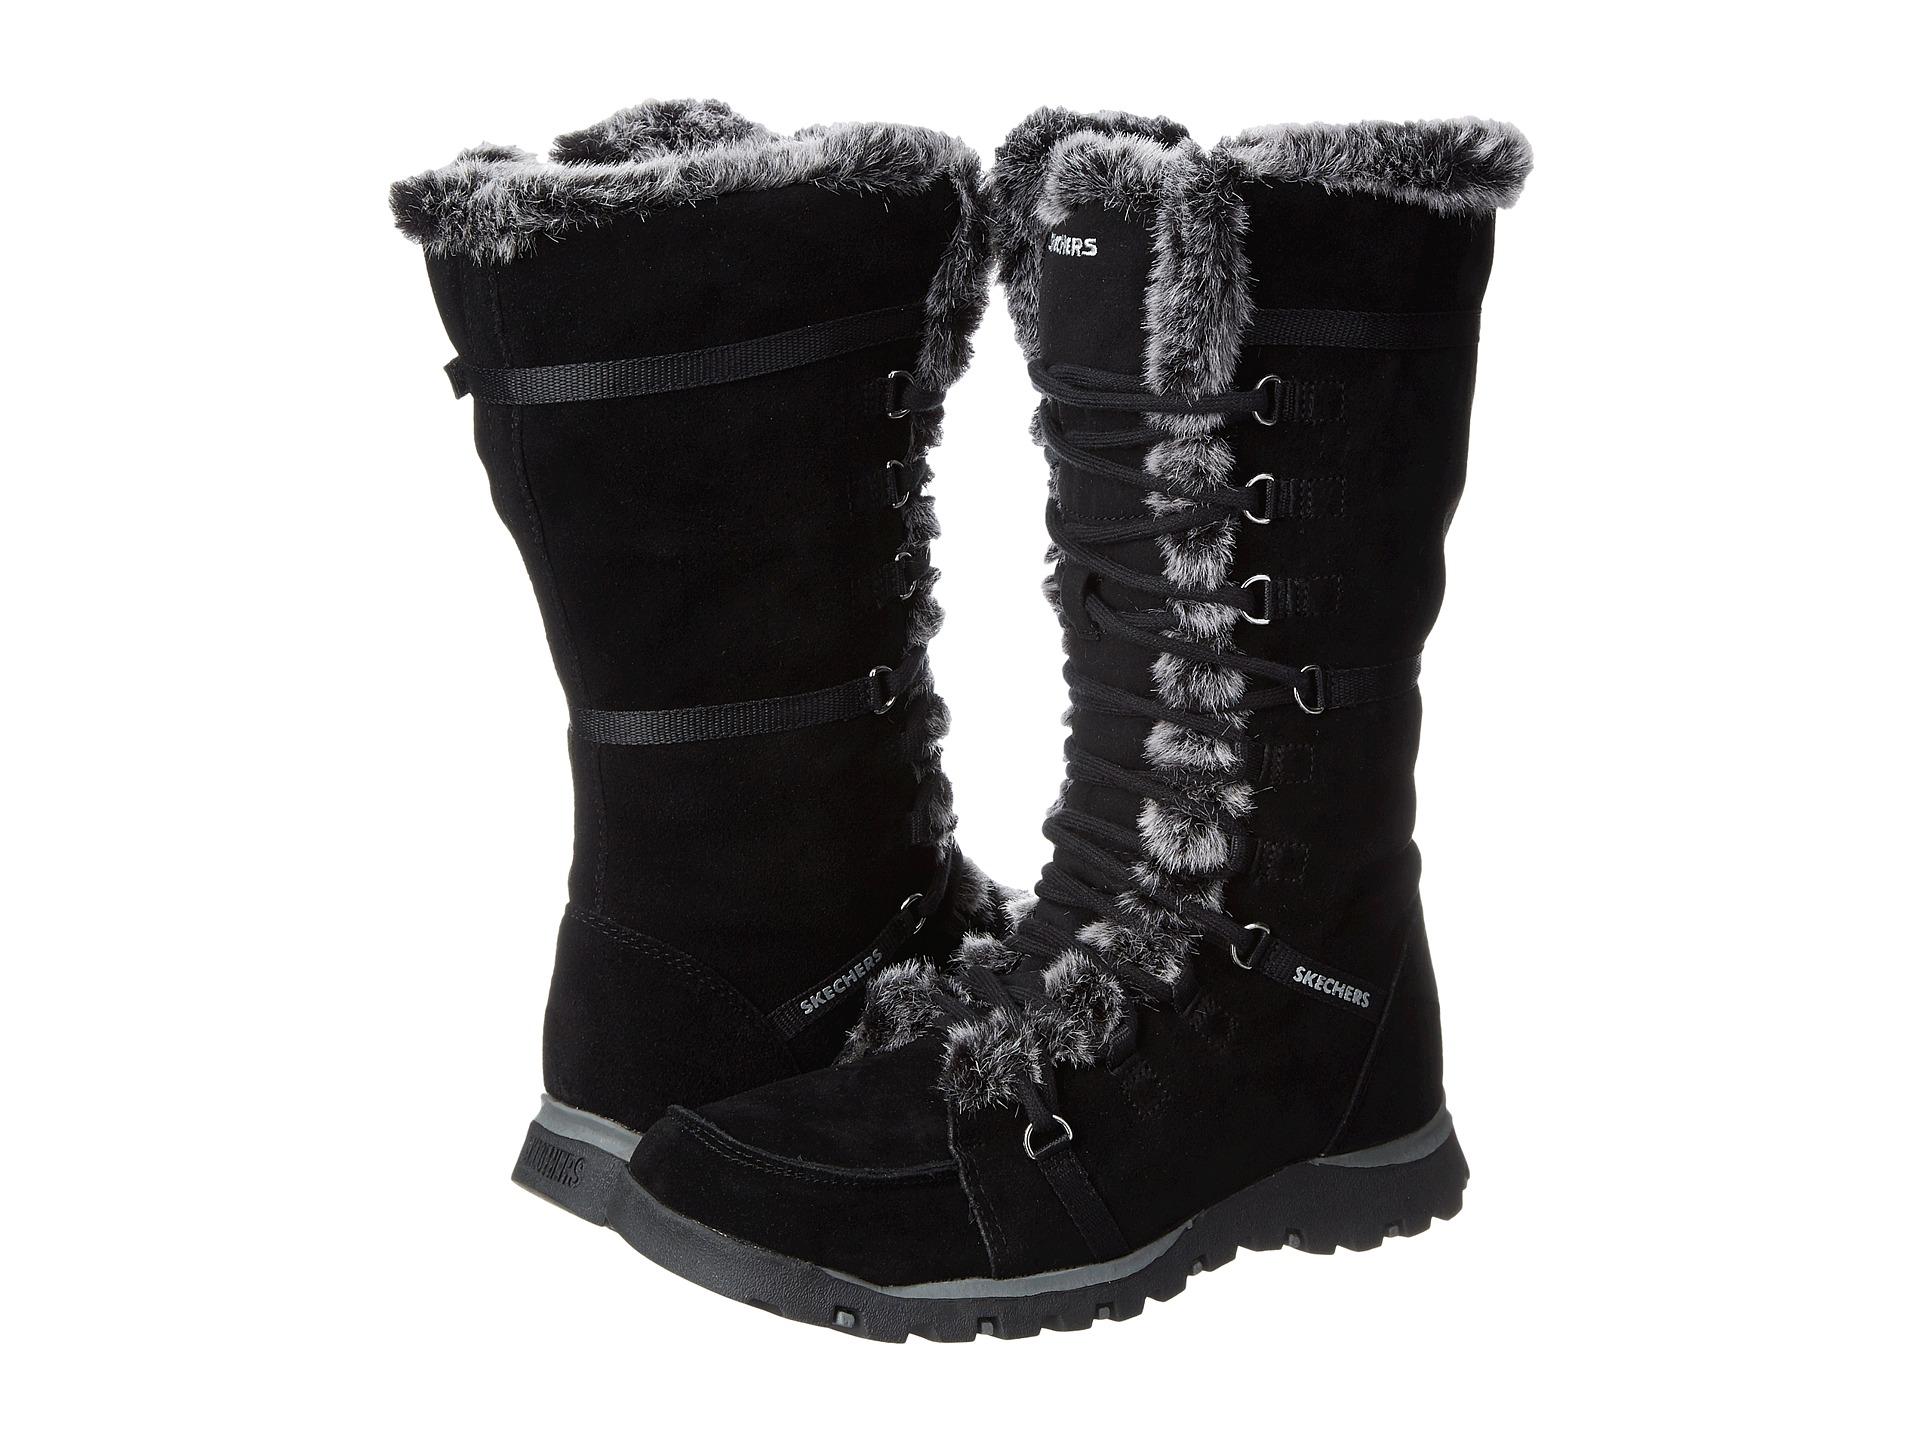 Worksheet Heine Boots skechers grand jams winter boots national sheriffs association boots